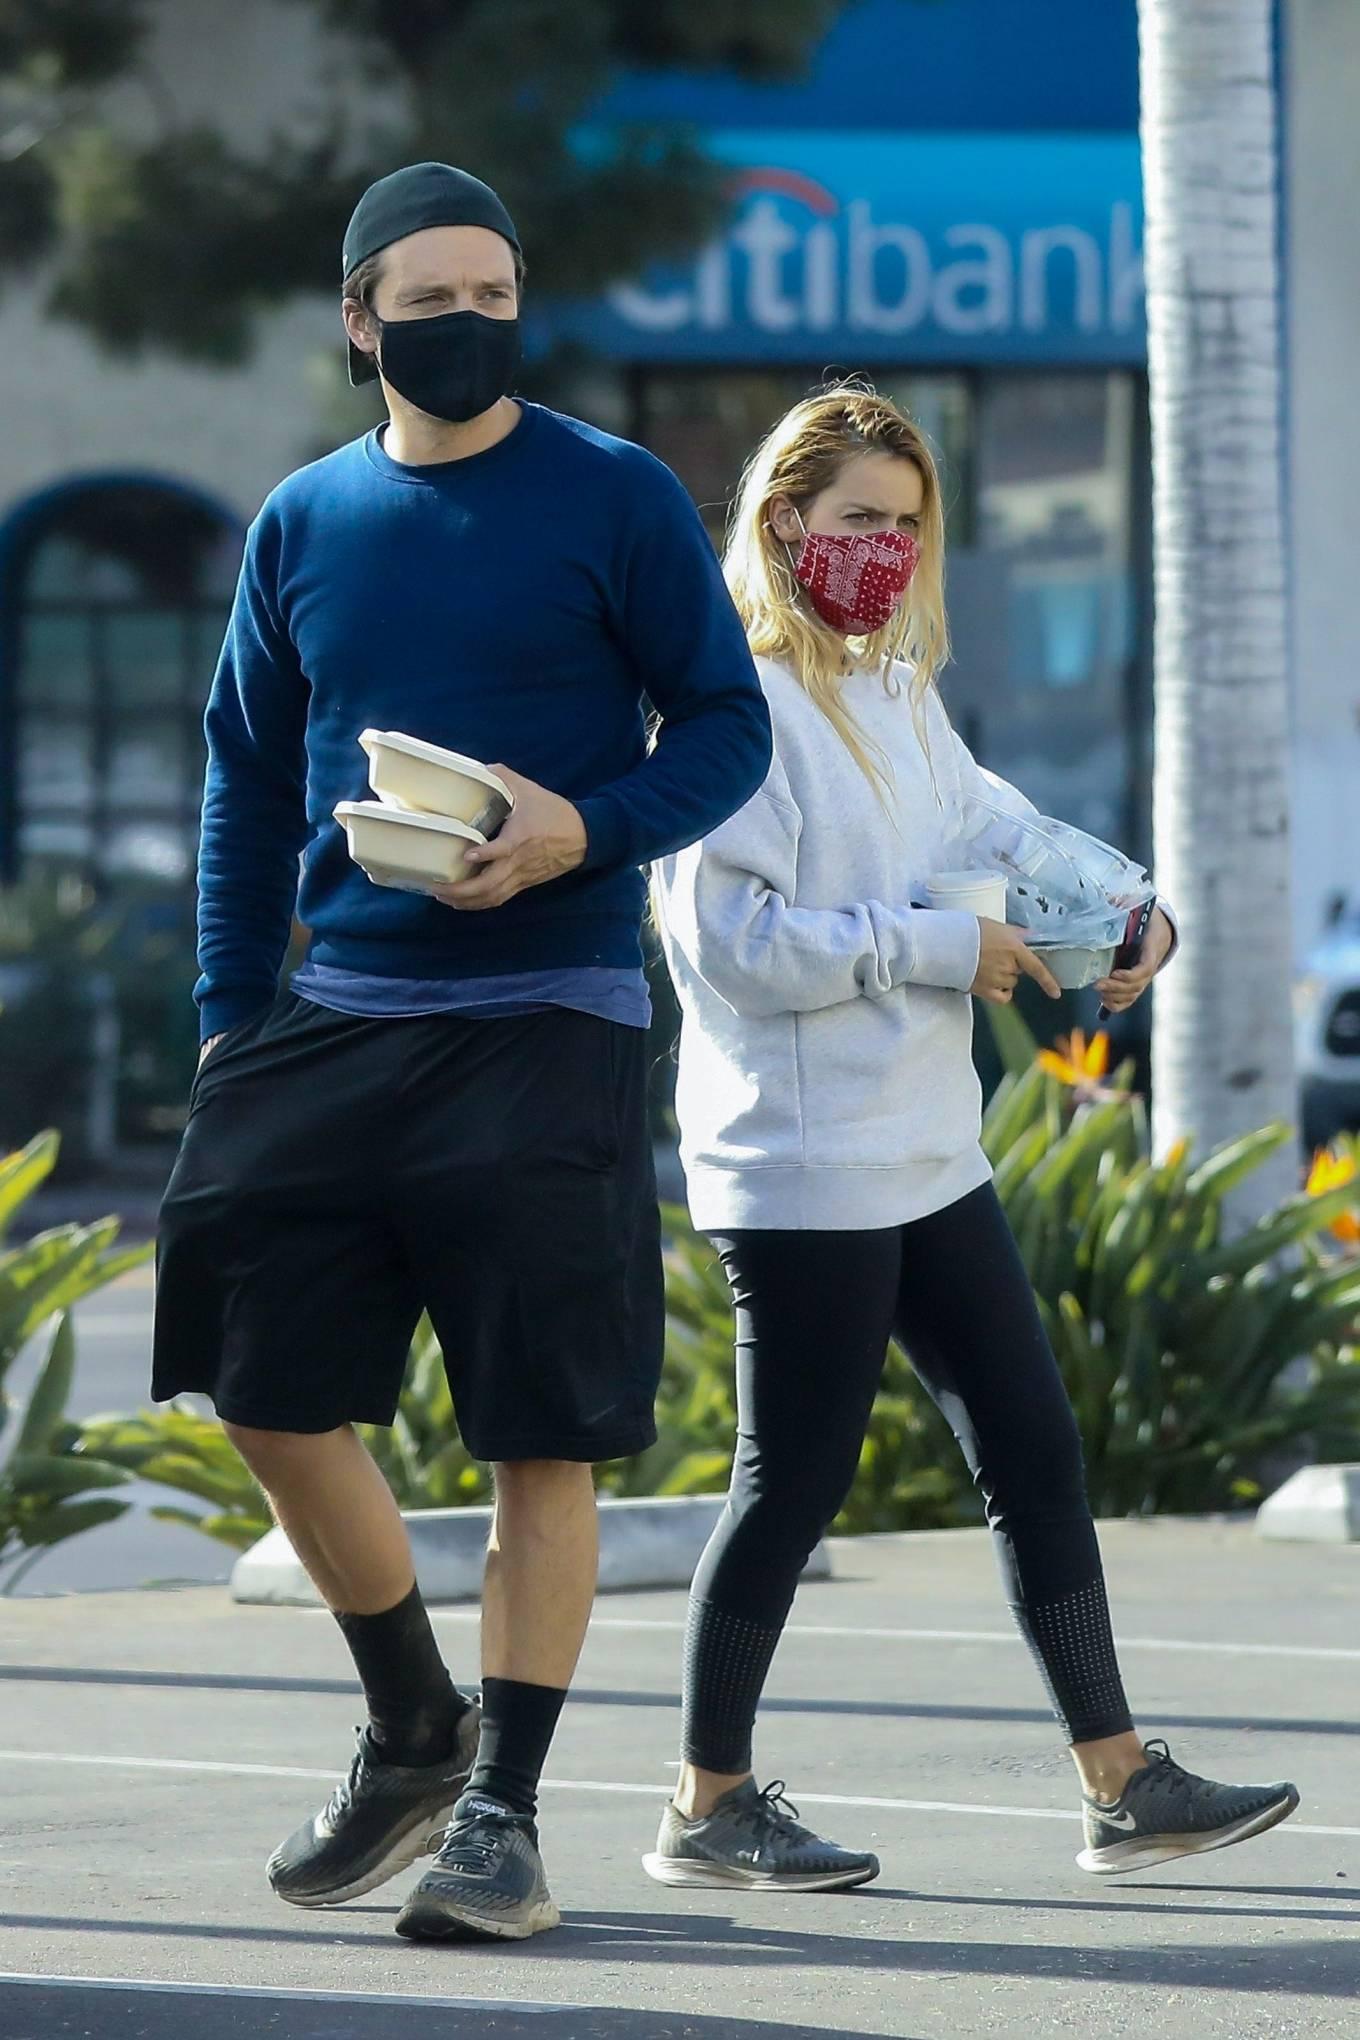 Sebastian Stan and Alejandra Onieva - Seen at The Grove in Los Angeles